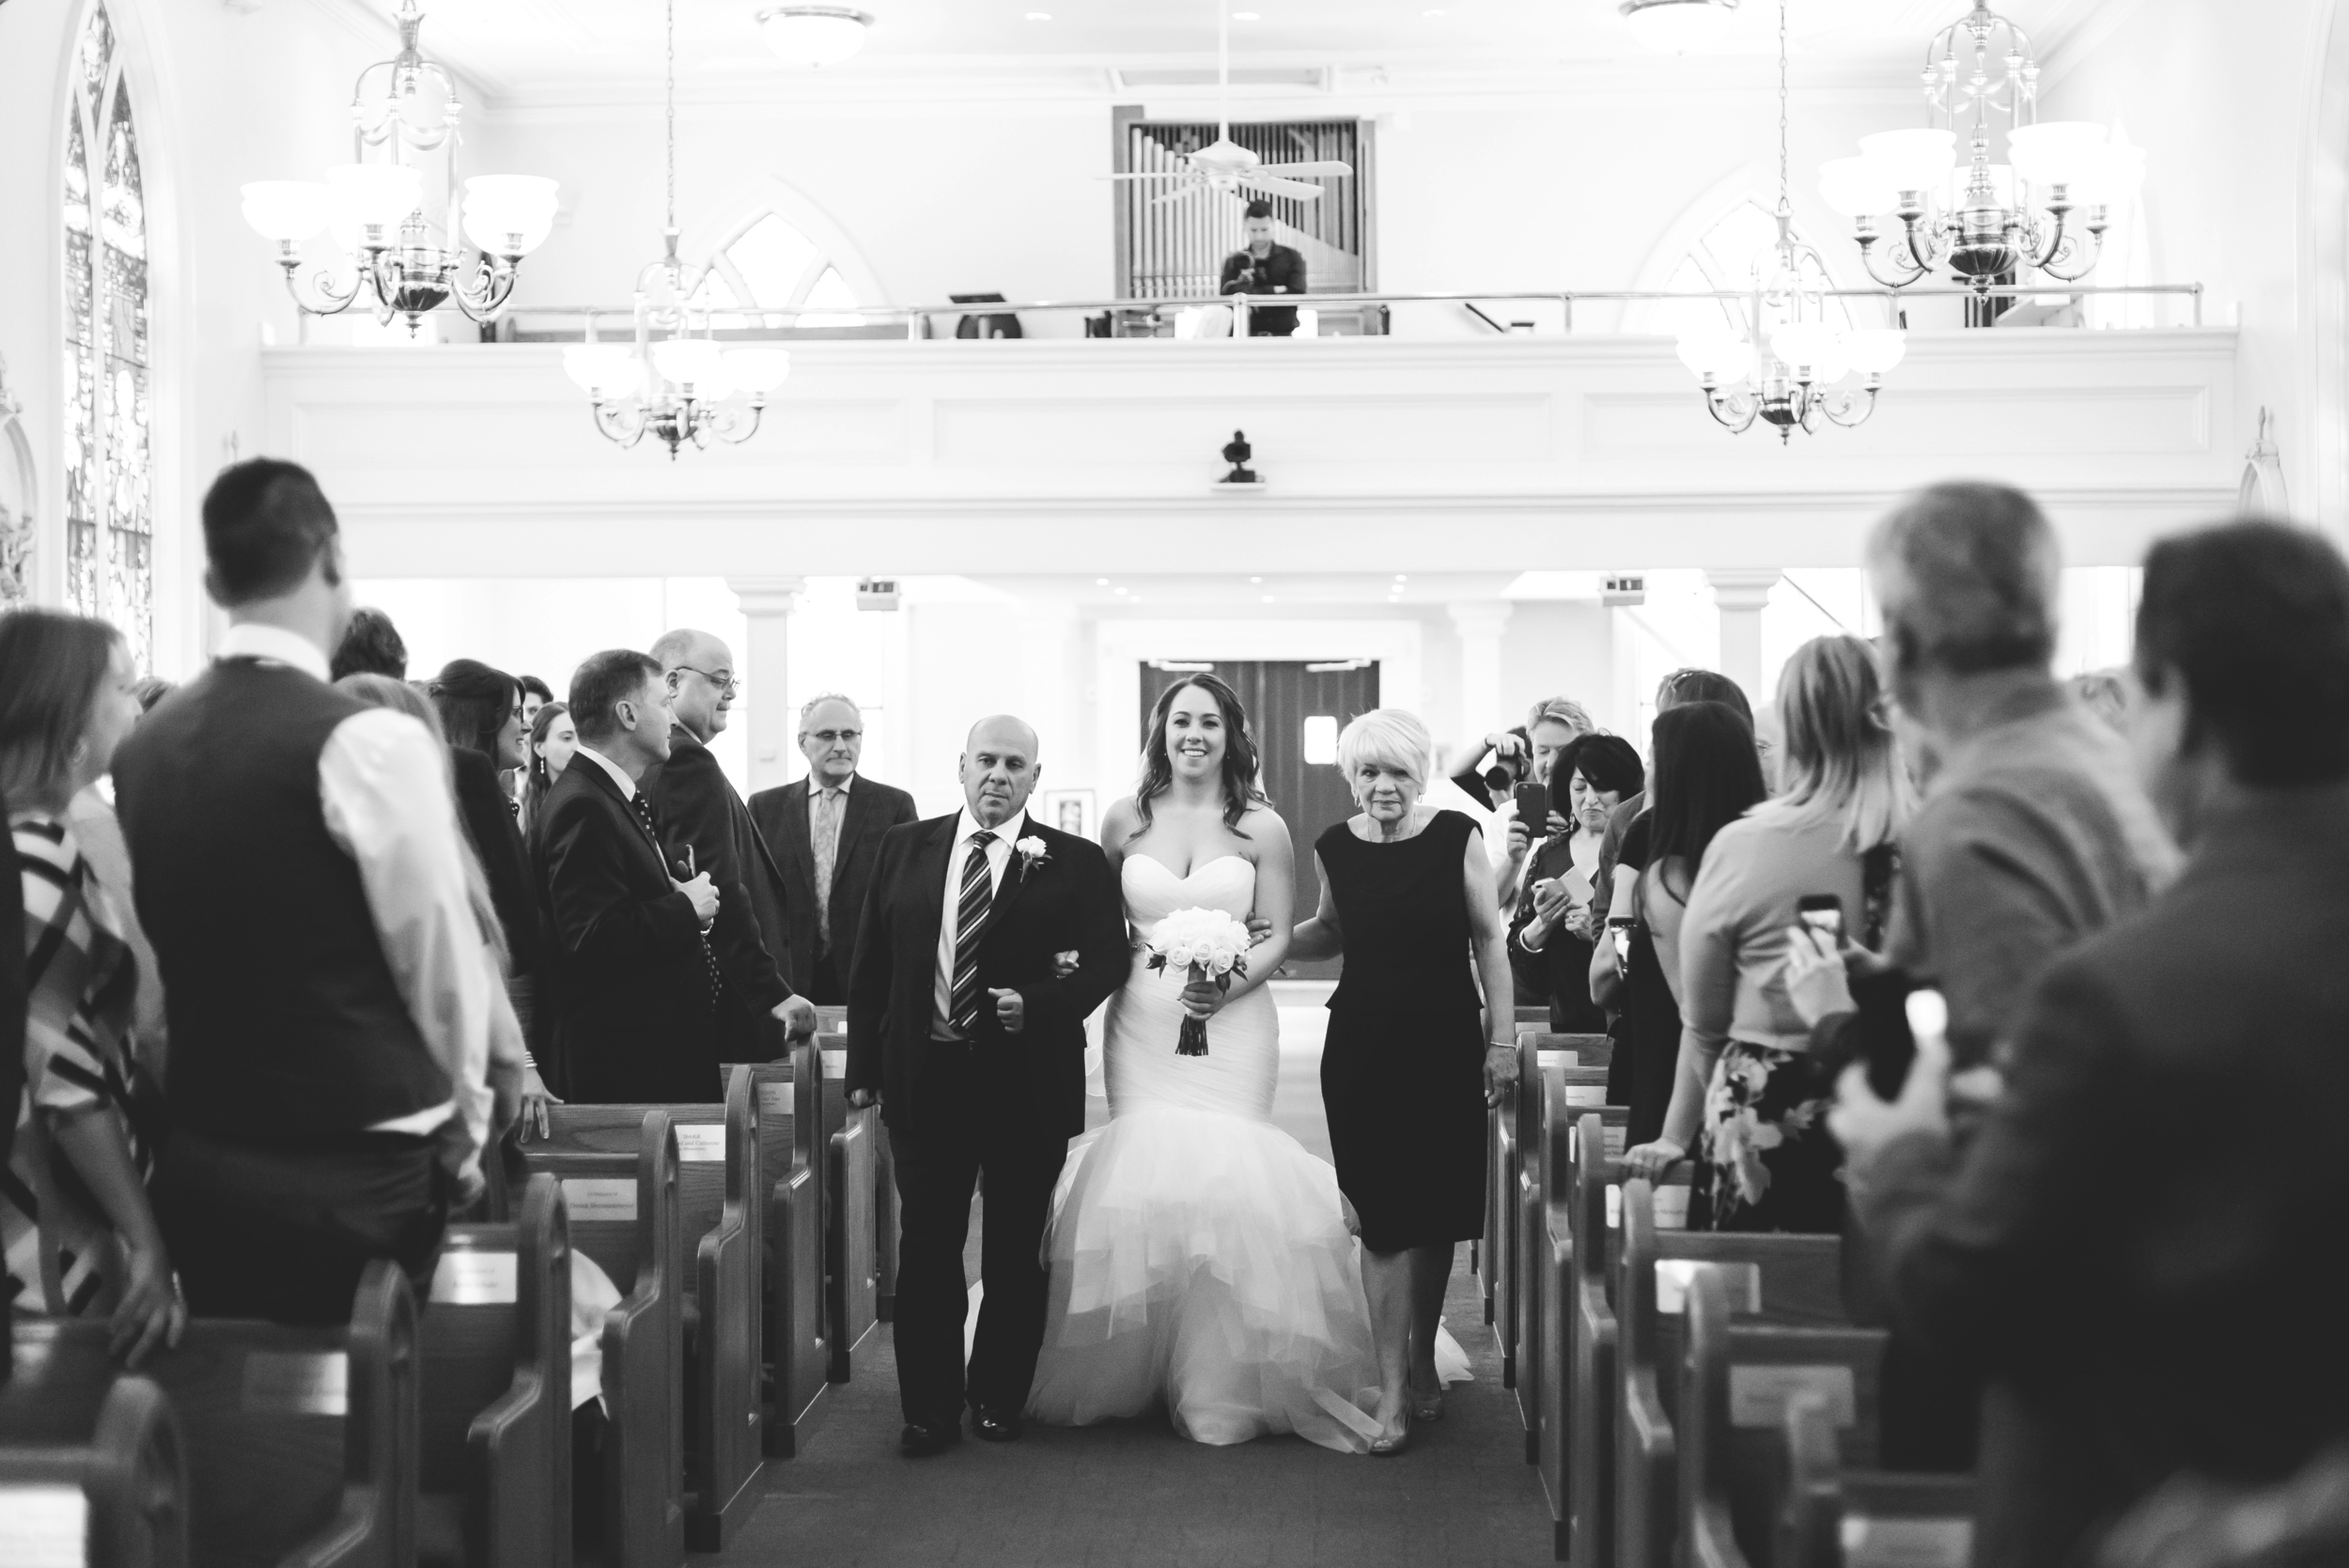 Wedding-Harbour-Banquet-Center-Oakville-Photographer-Wedding-Hamilton-Saint-James-Espresso-Downtown-HamOnt-GTA-Niagara-Toronto-Moments-by-Lauren-Photography-Photo-Image-12.png